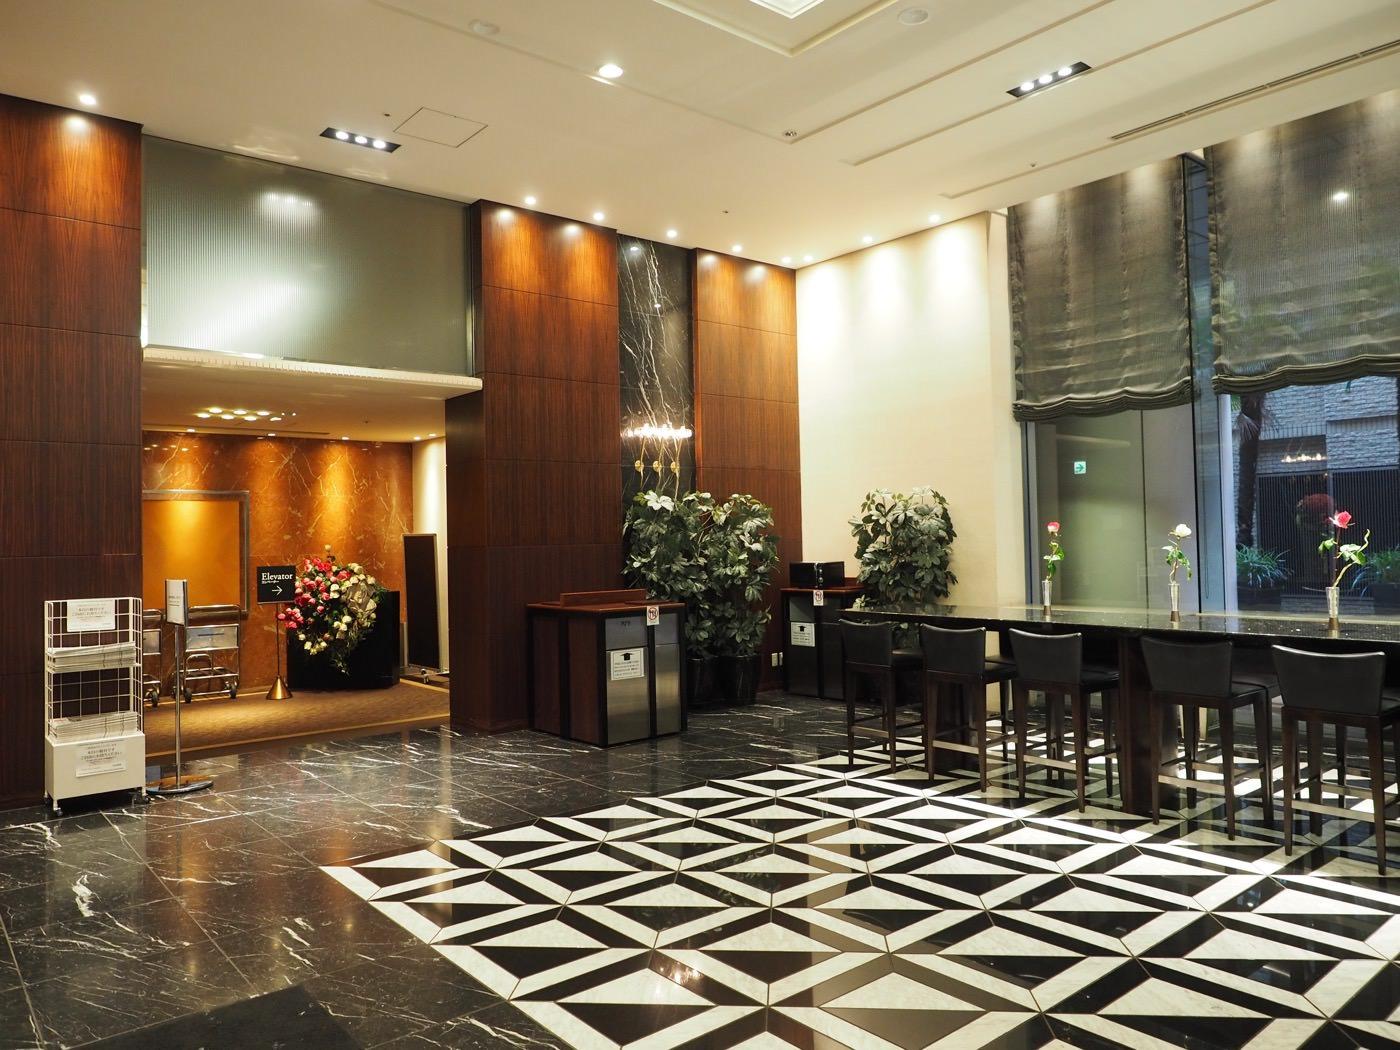 [東京] 六本木 商務旅館 Villa Fontaine Roppongi - 一口冒險 Bitesized Adventure